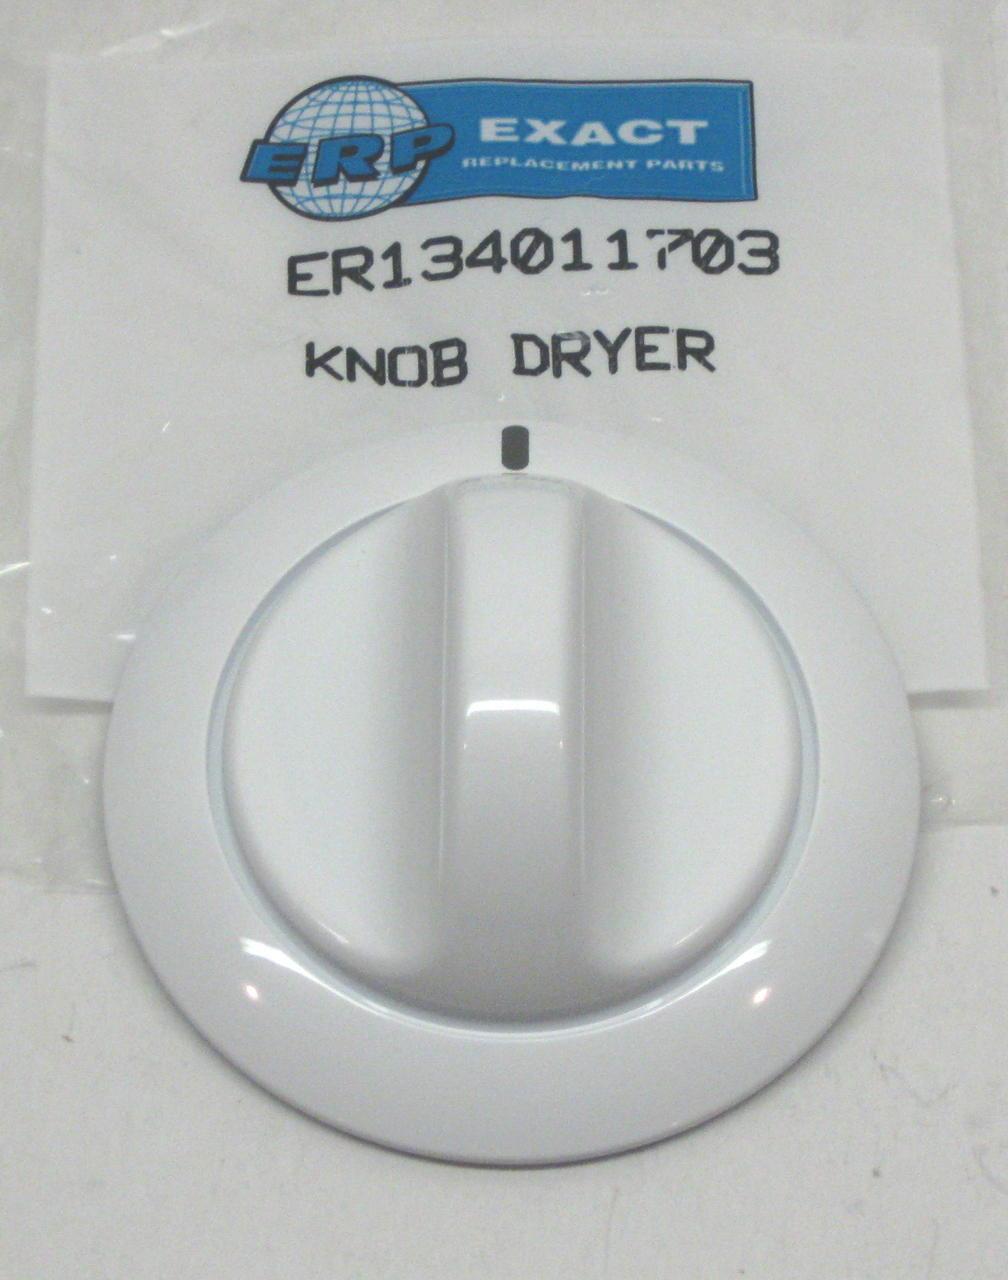 Details about  /KENMORE DRYER KNOB PART# 345340